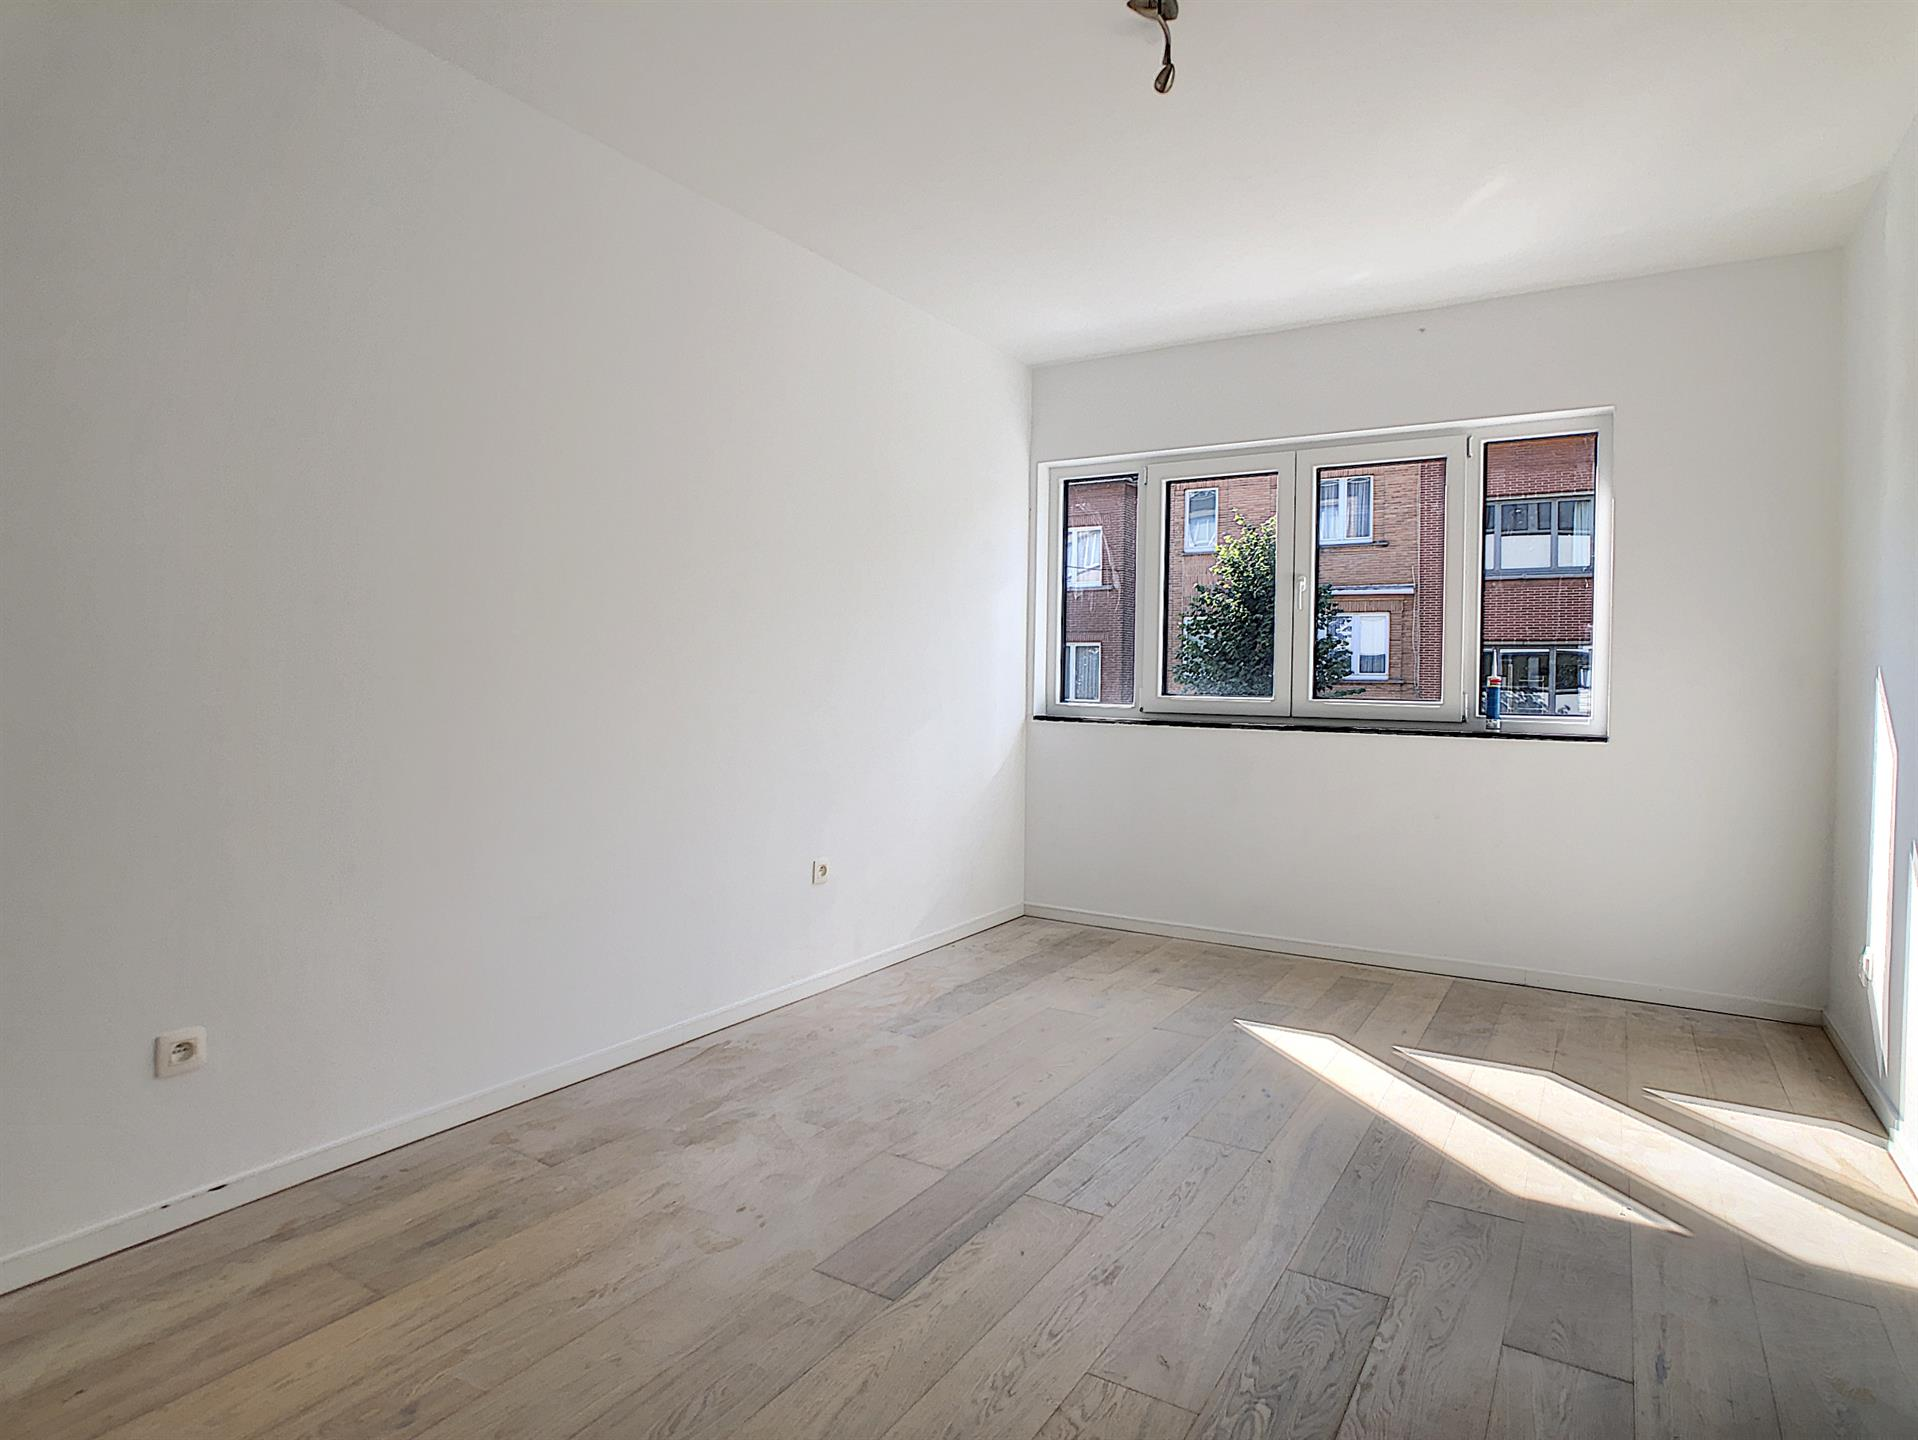 Appartement - Anderlecht - #4252377-8